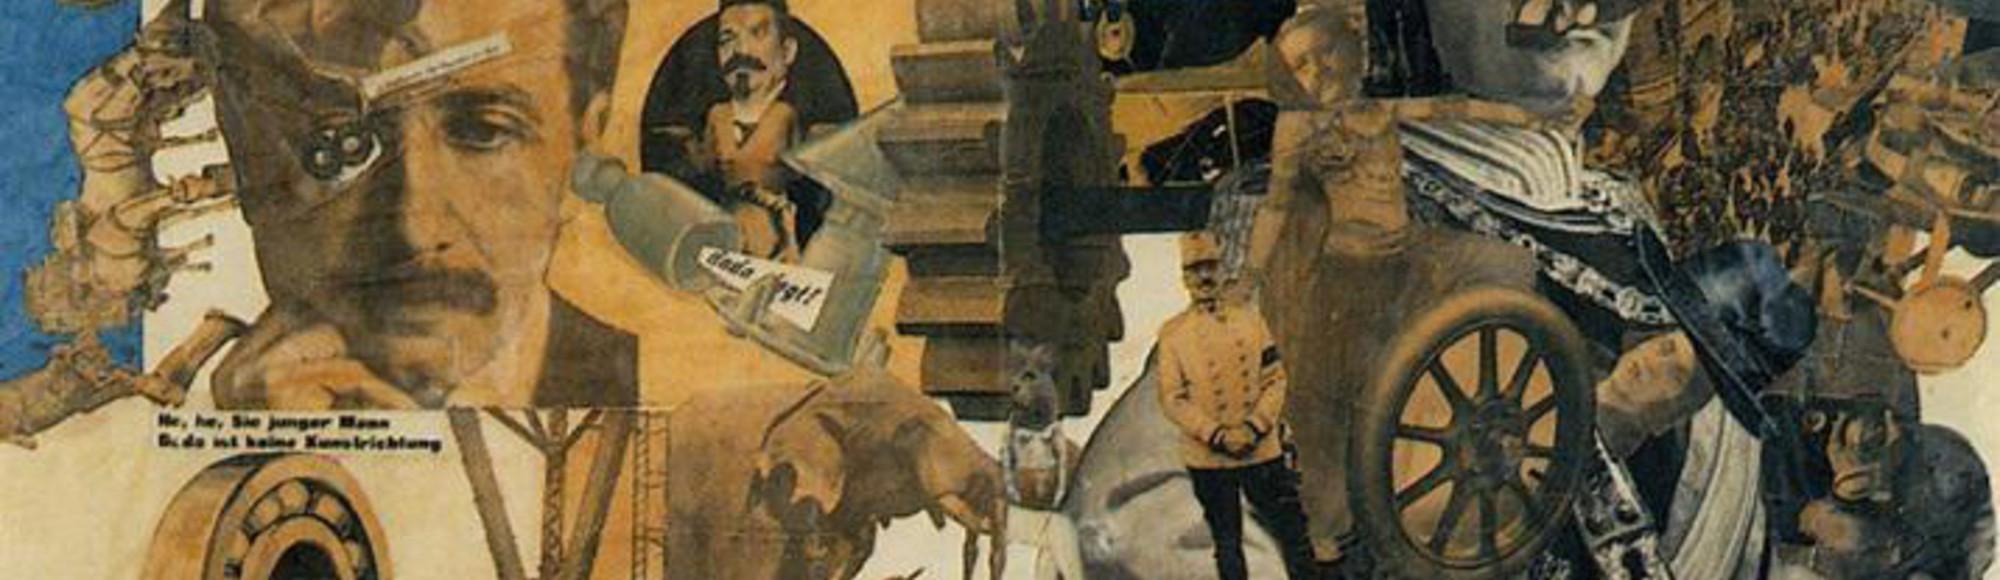 Dadaism Created the 21st Century